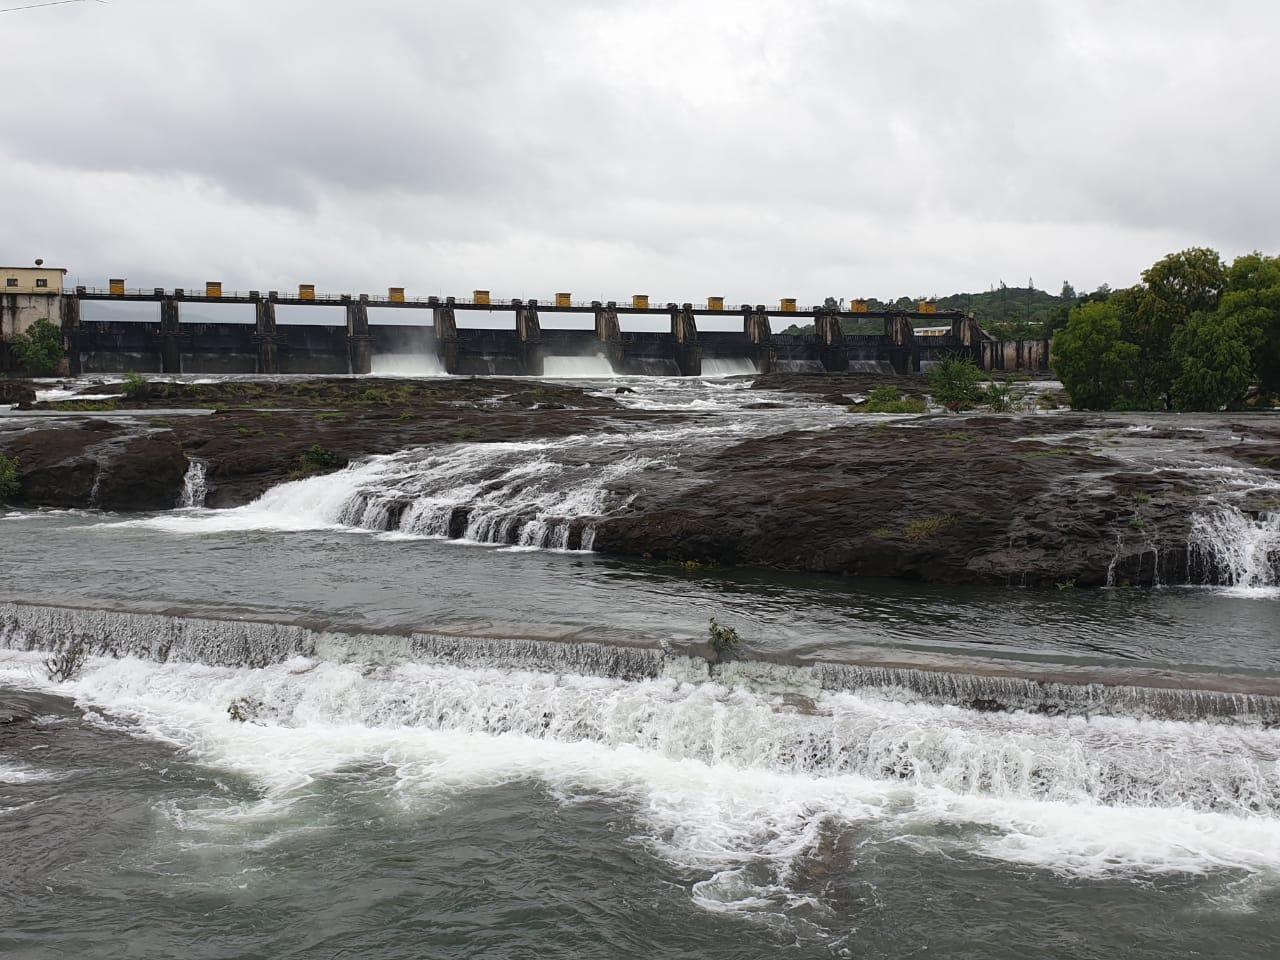 'खडकवासला' शंभर टक्के भरले; नदीत पाणी सोडले ...2568 क्यूसेकने विसर्ग